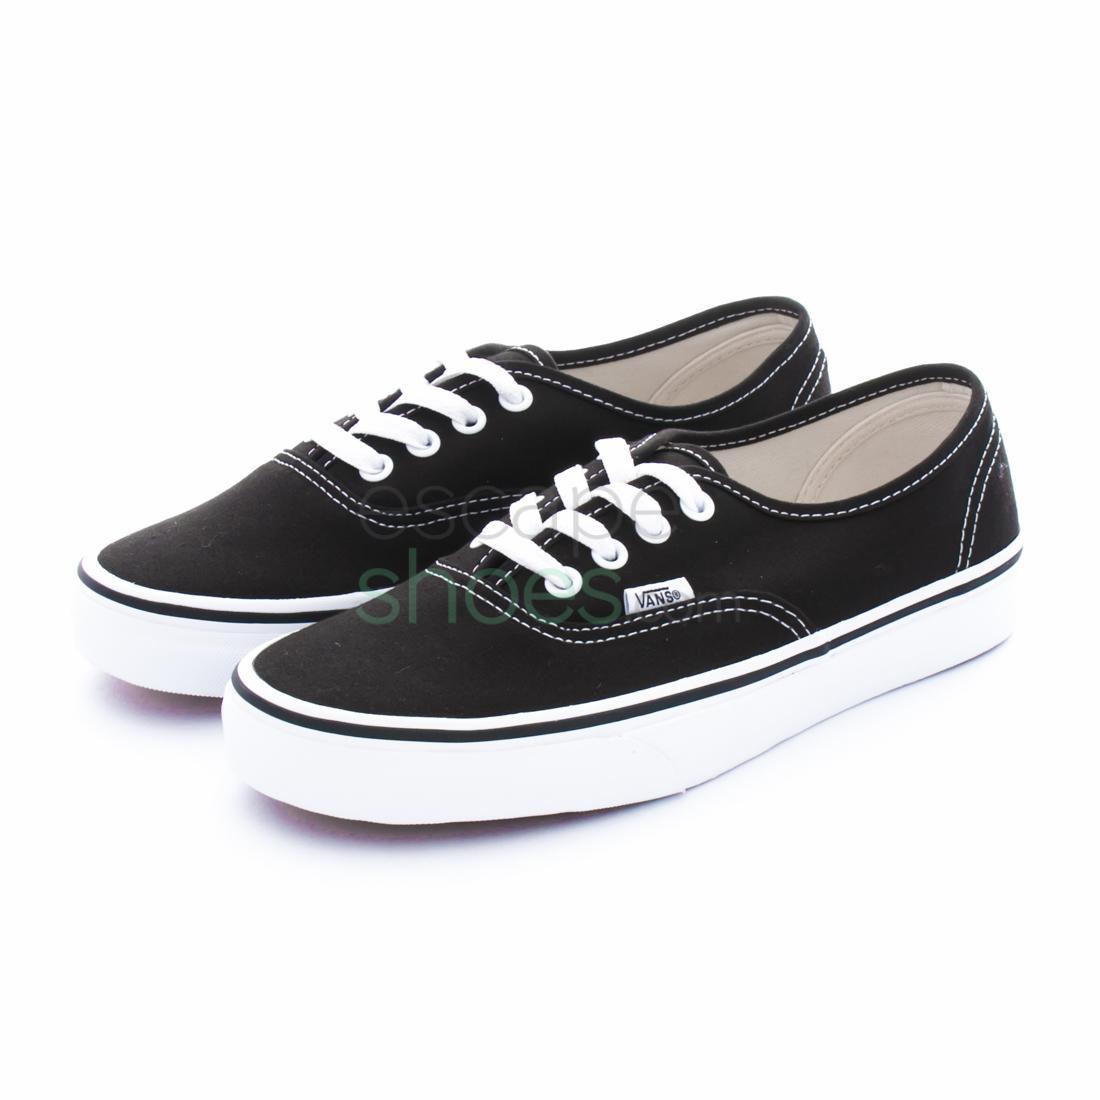 zapatillas vans negra